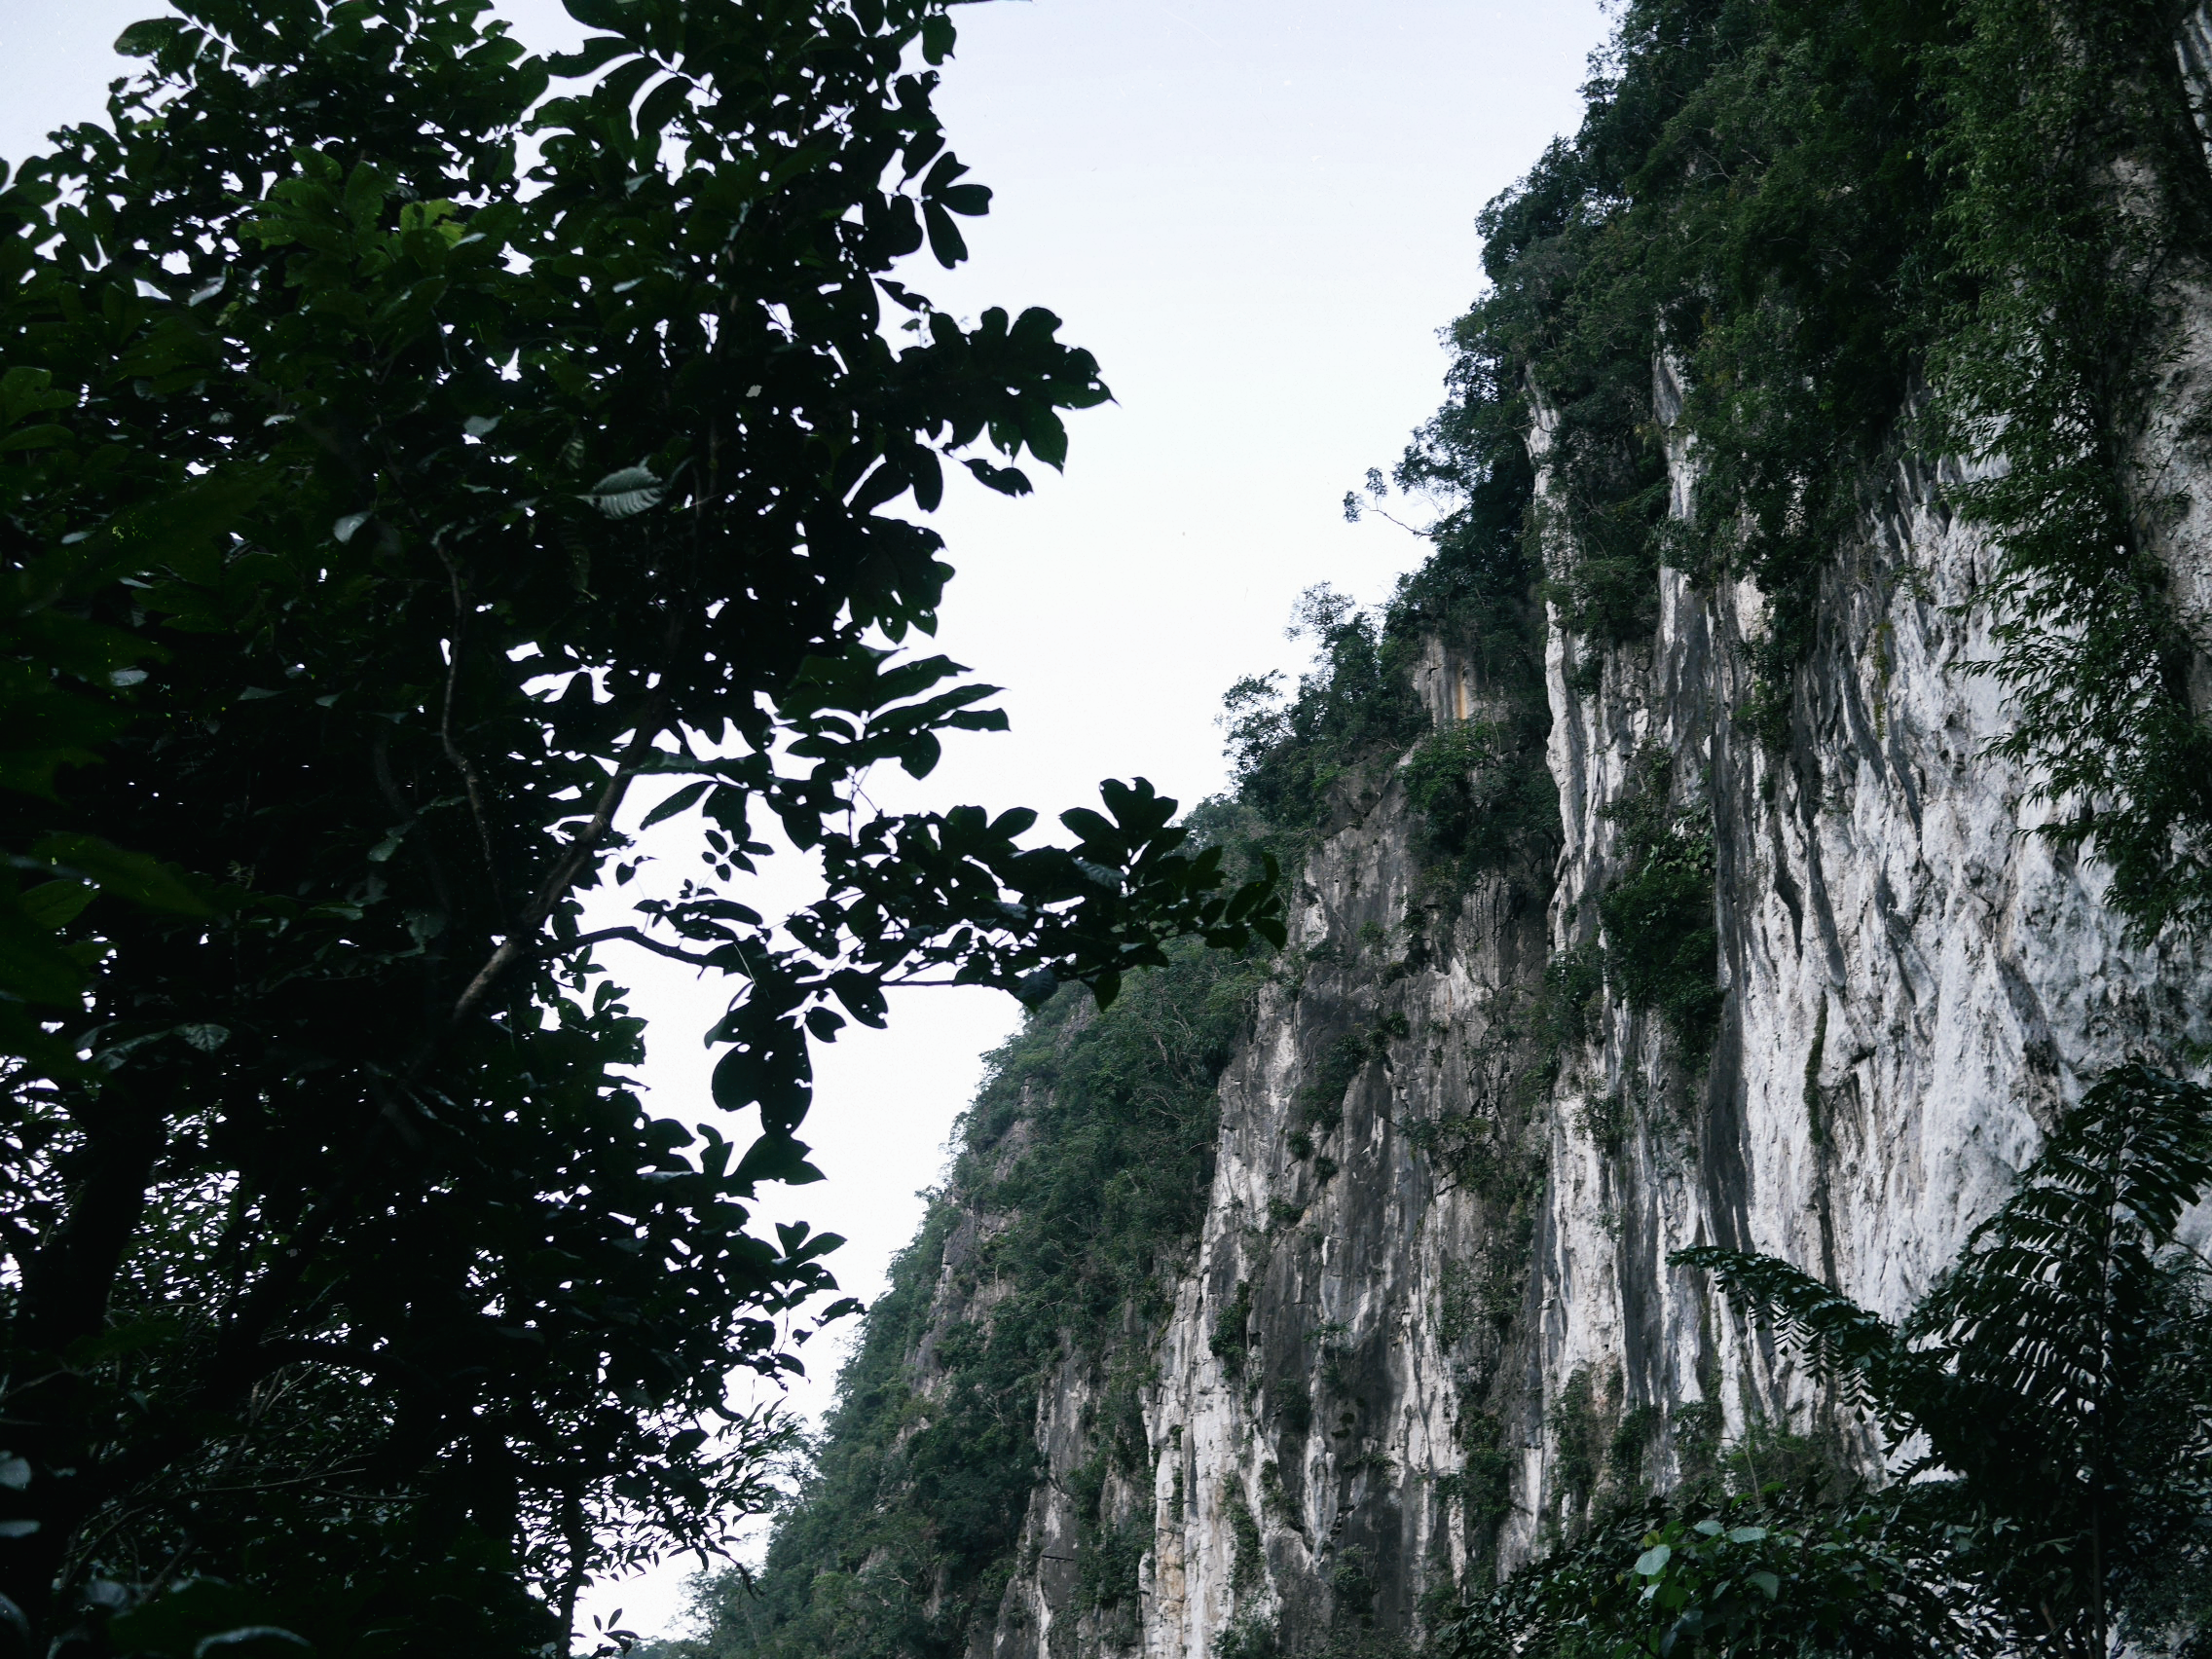 doi cave